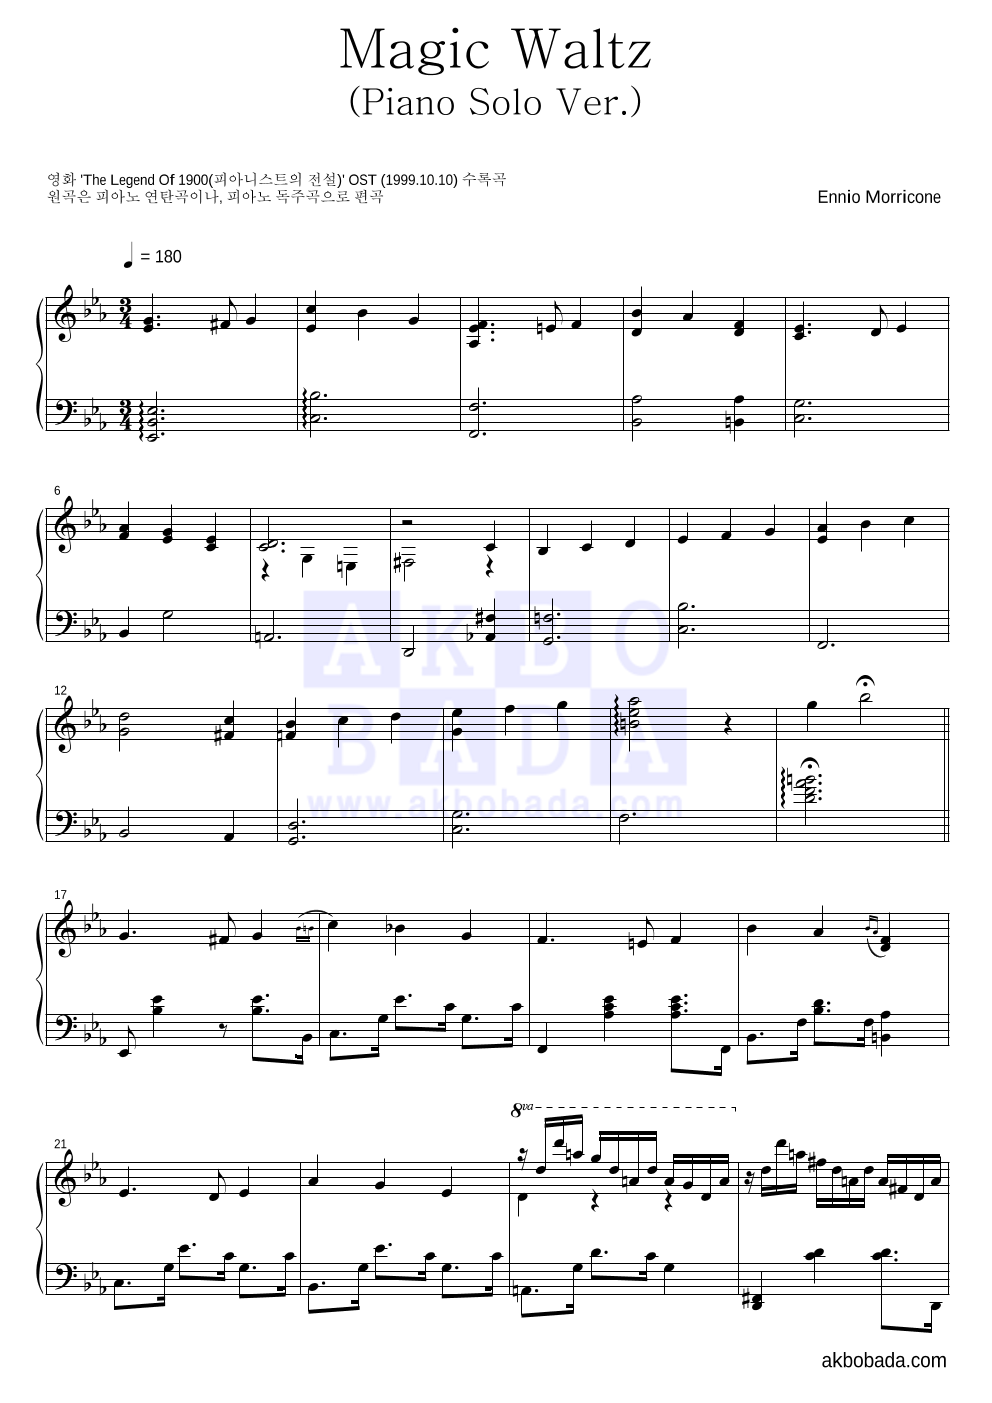 Ennio Morricone - Magic Waltz 피아노 2단 악보